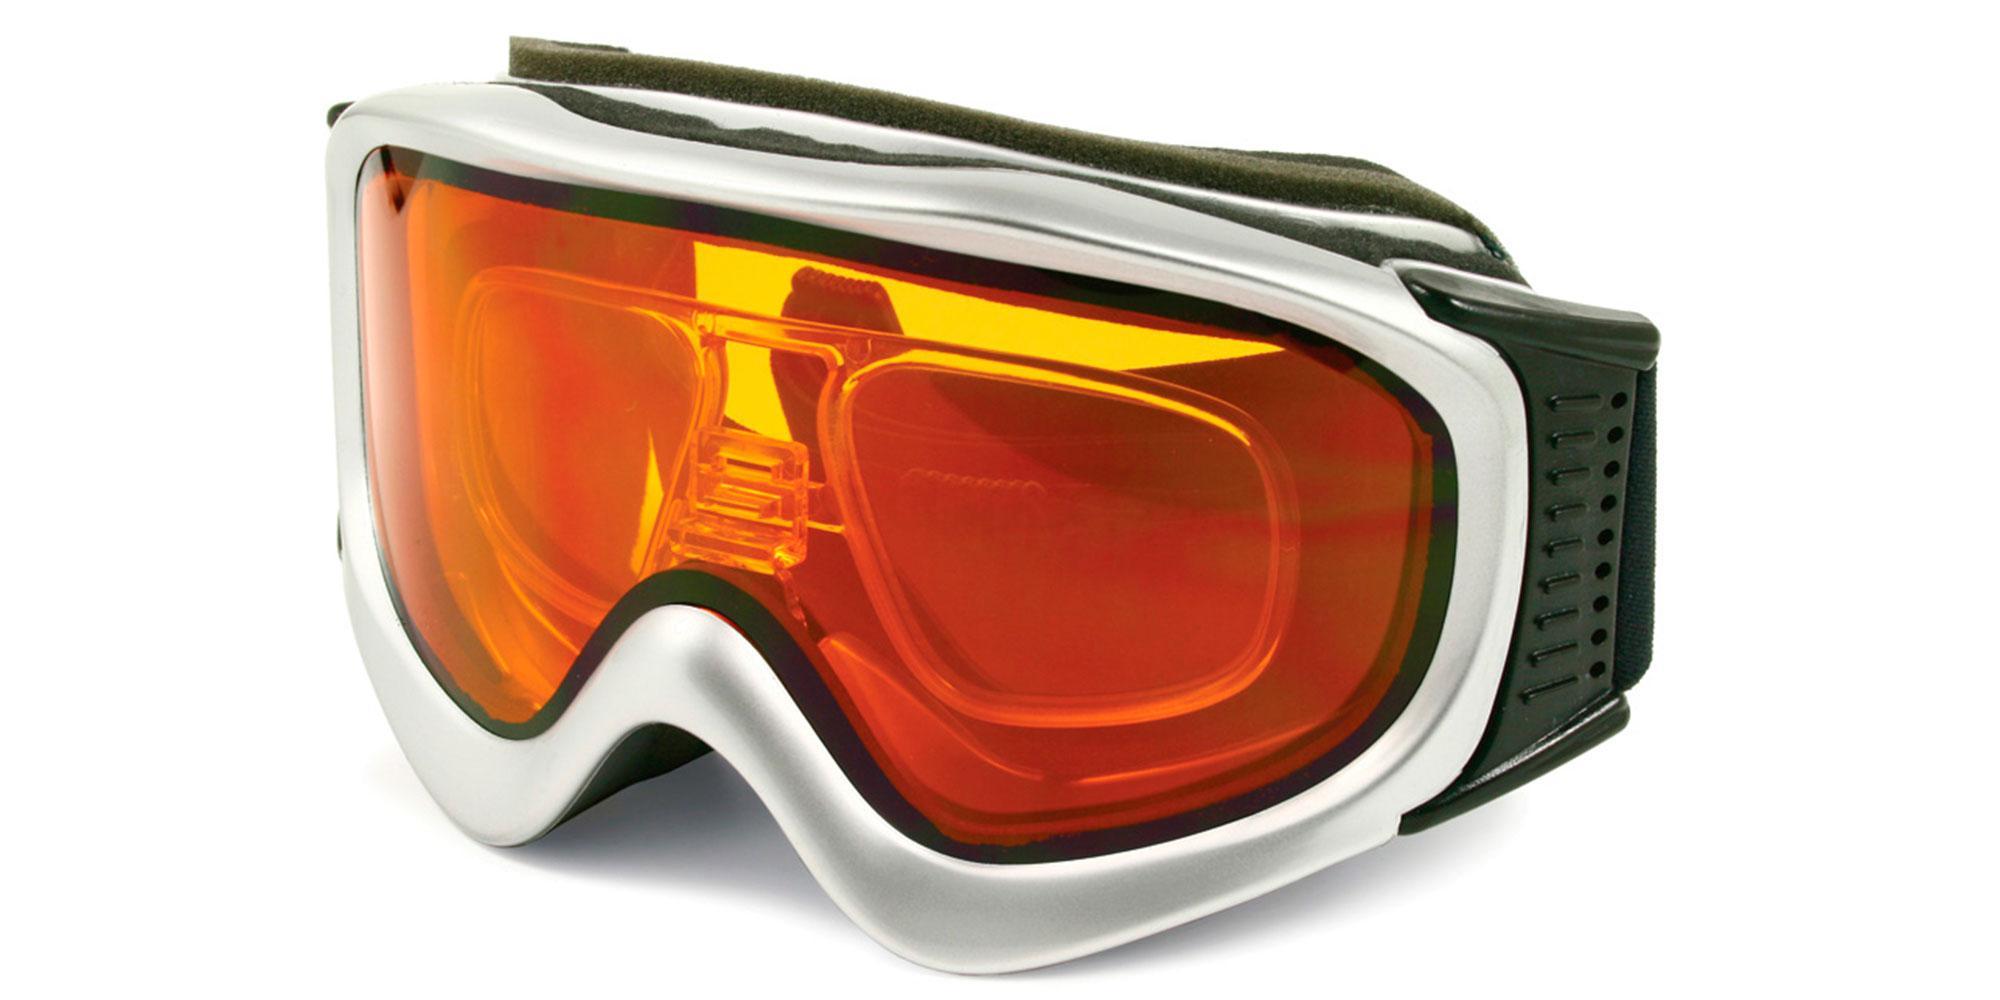 Silver / Amber Lens SRX06 Goggles, Sports Eyewear